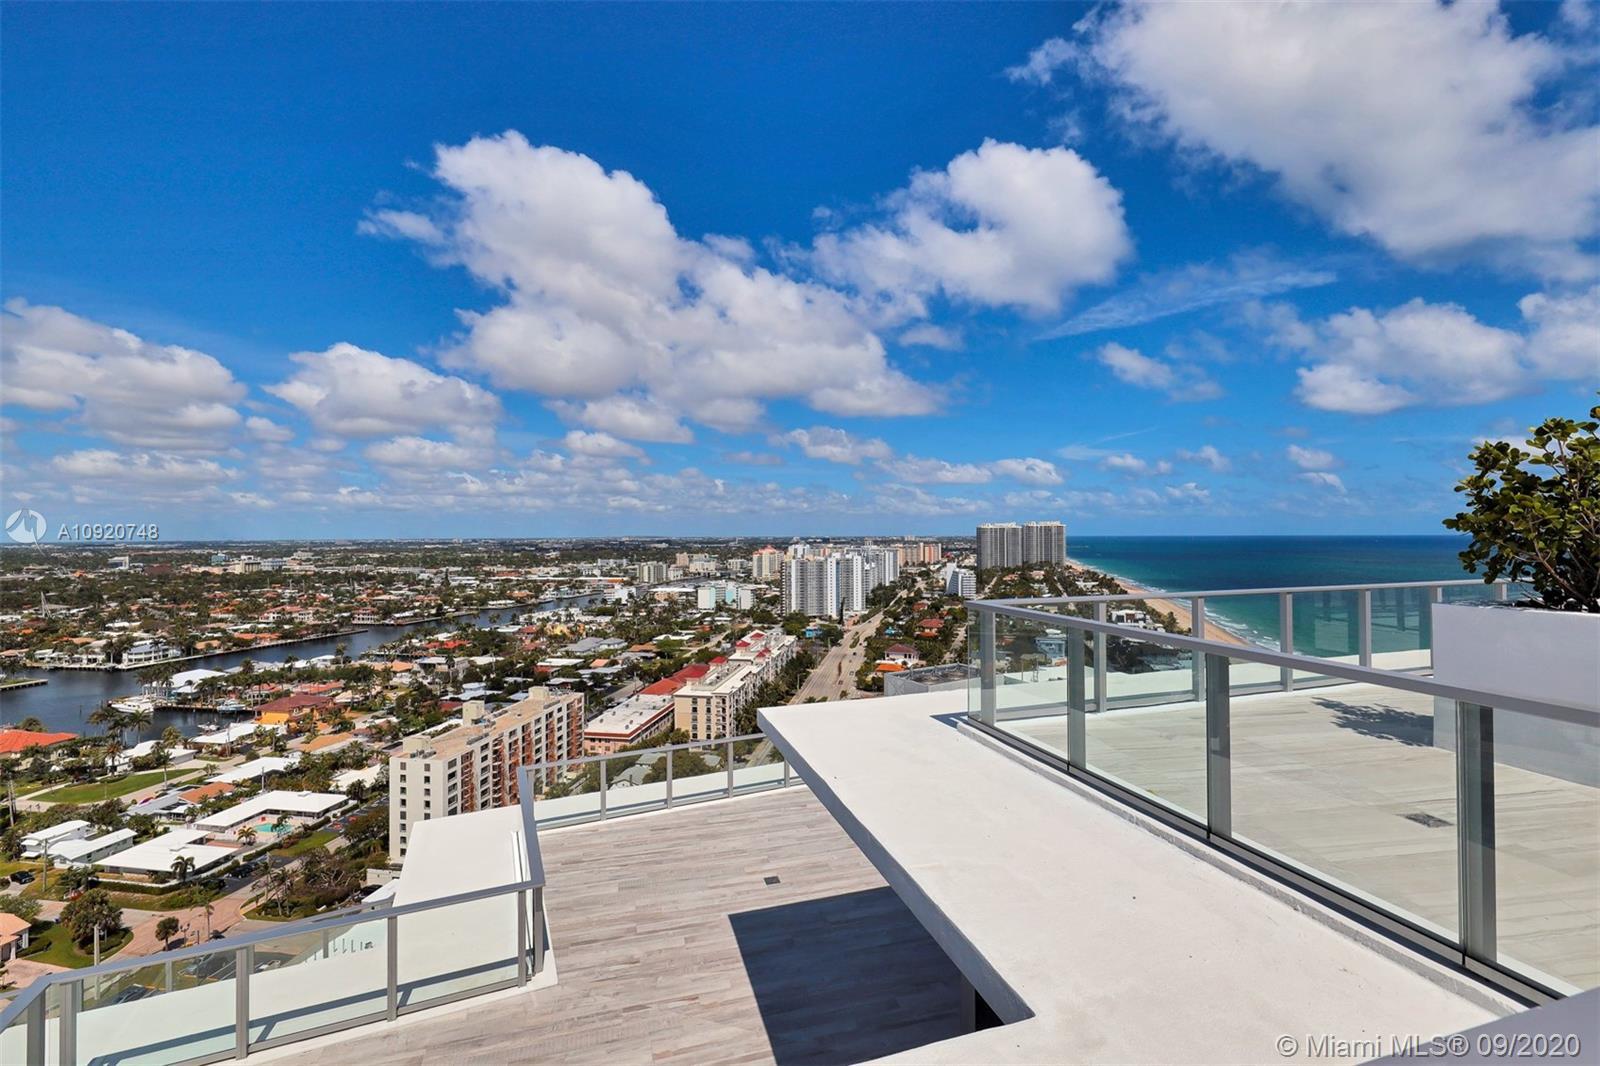 Auberge Beach Residences & Spa image #56